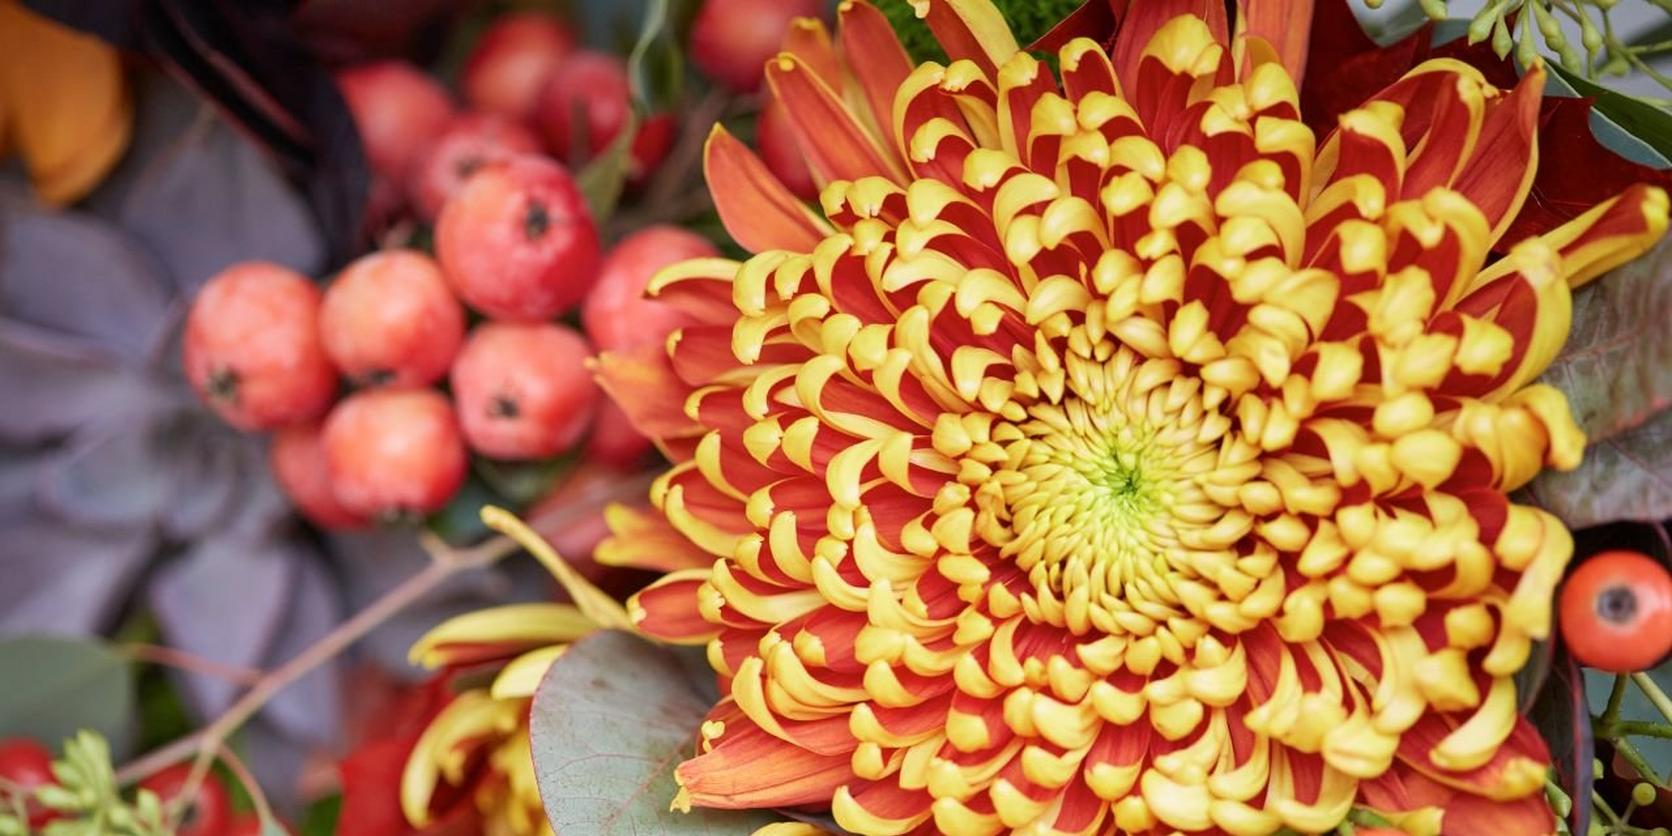 flower-types-autumn-flowers-1